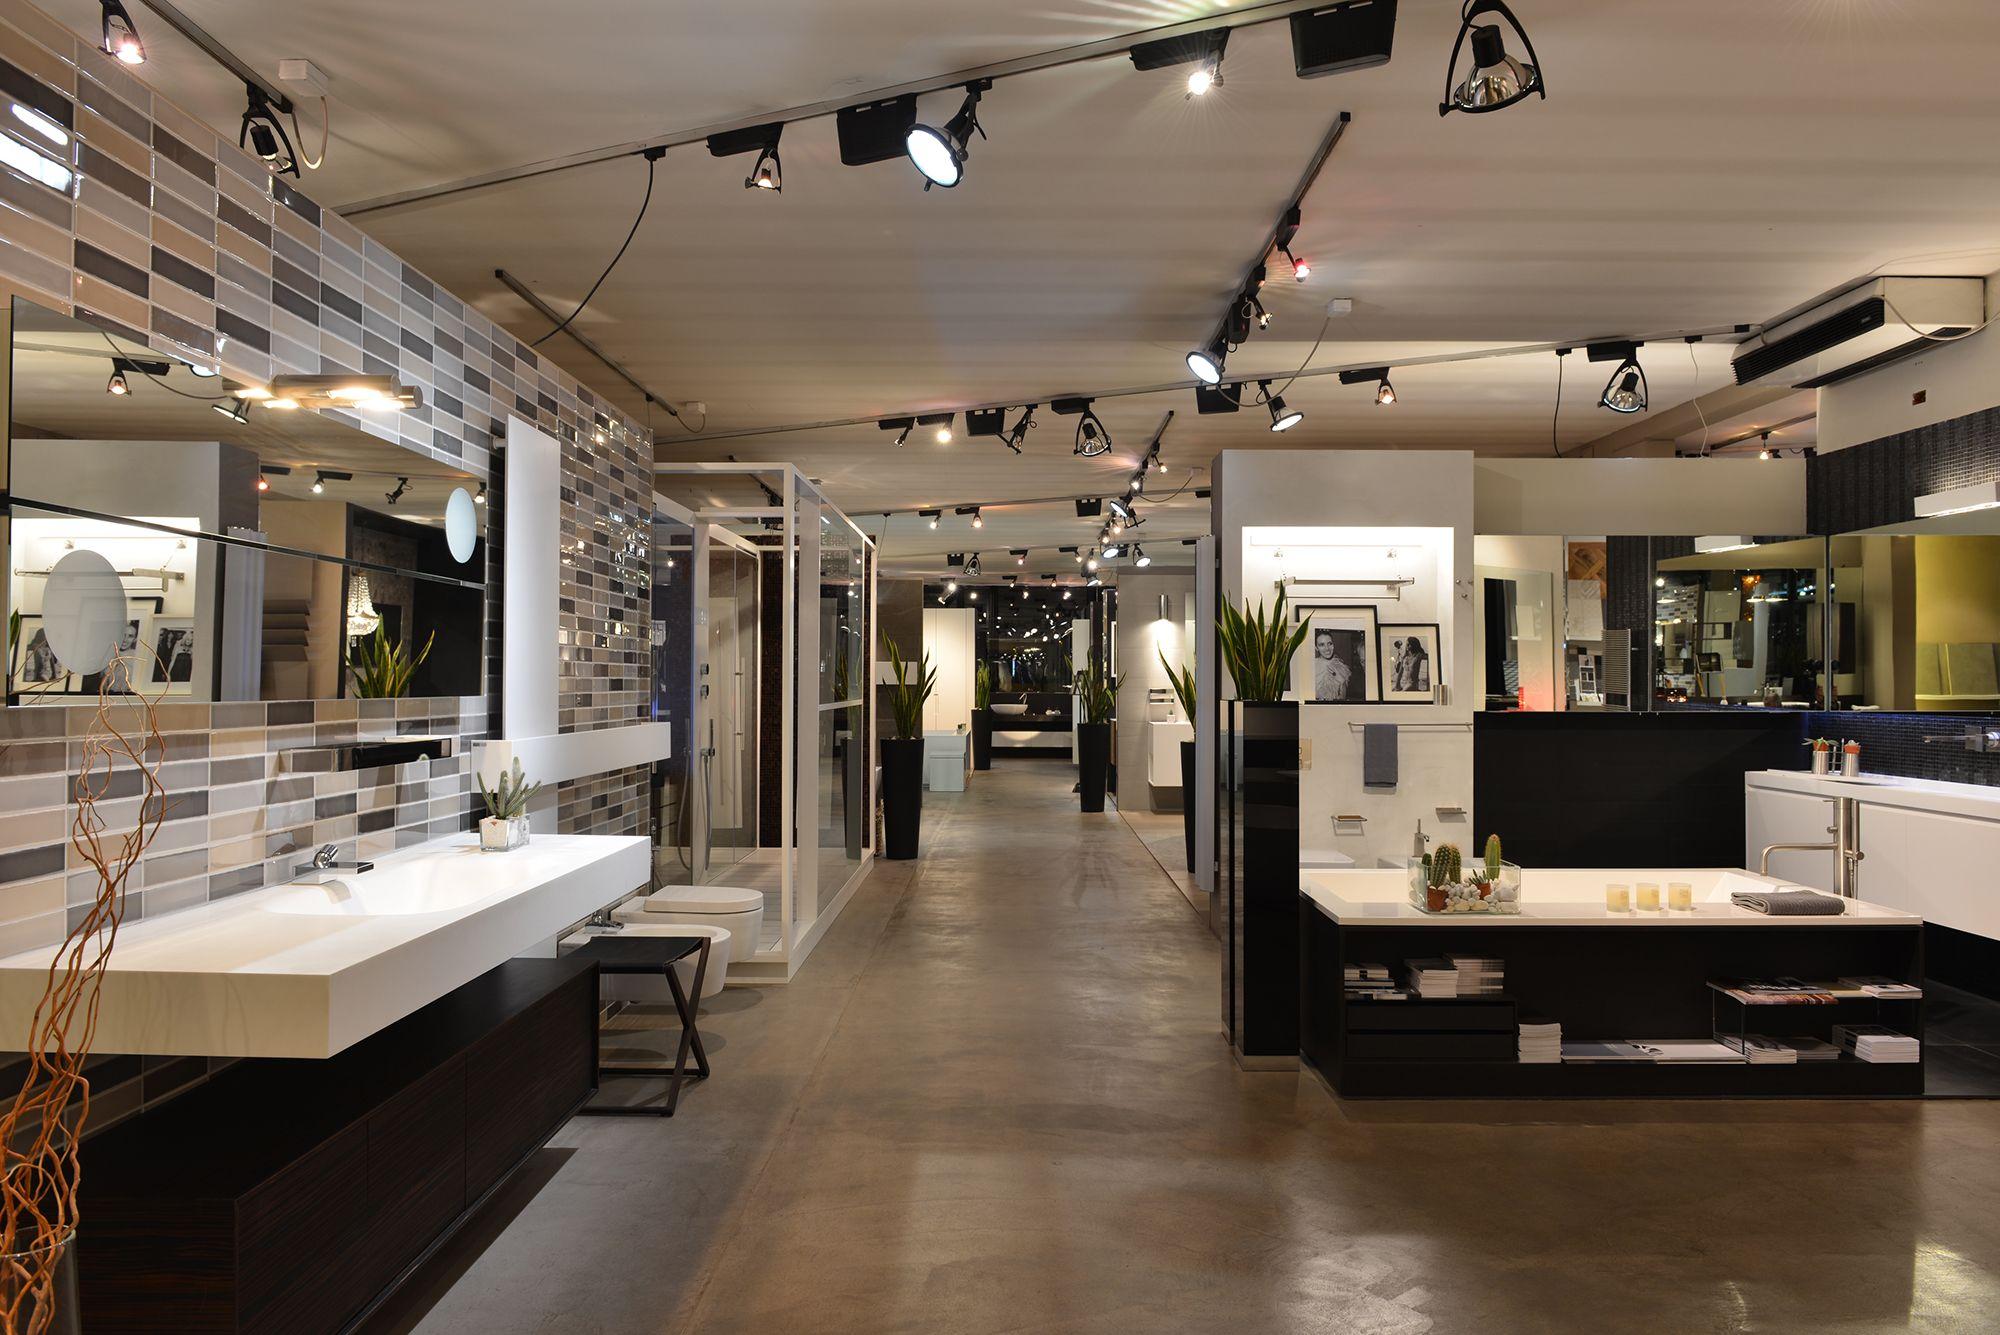 Showroom Arredo Bagno.Morandi Showroom Morandi Spa Showroom Arredamento Casa